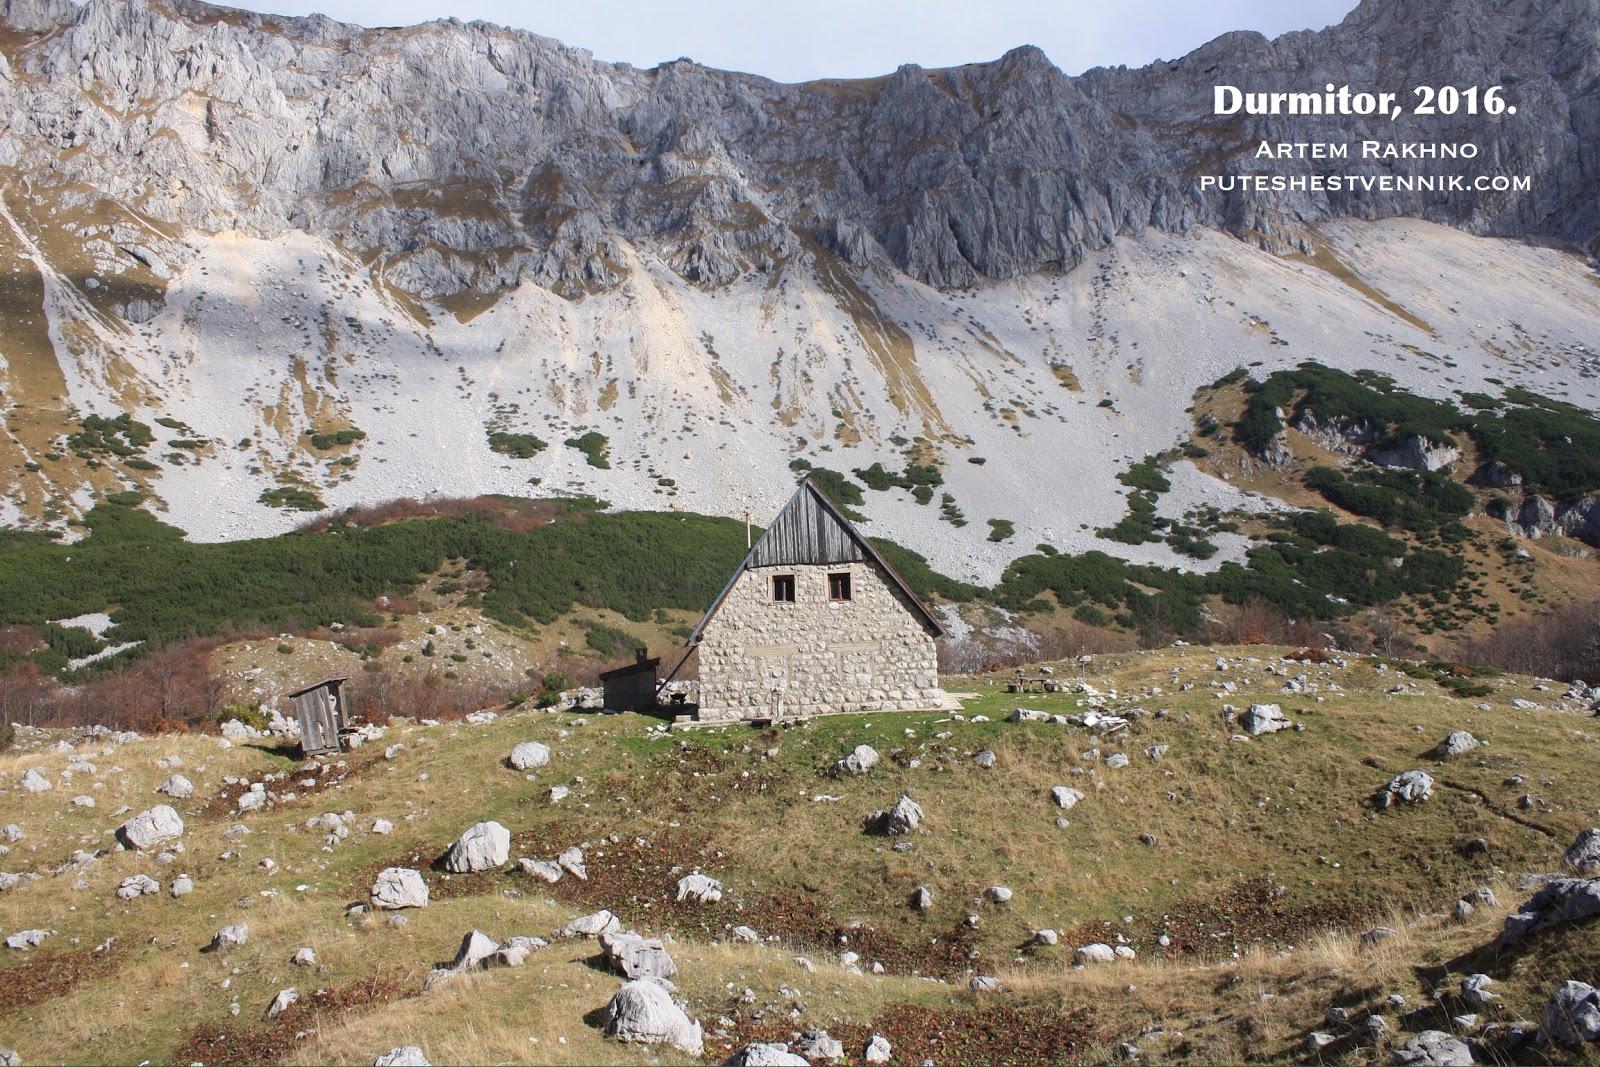 Дом в горах Дурмитора